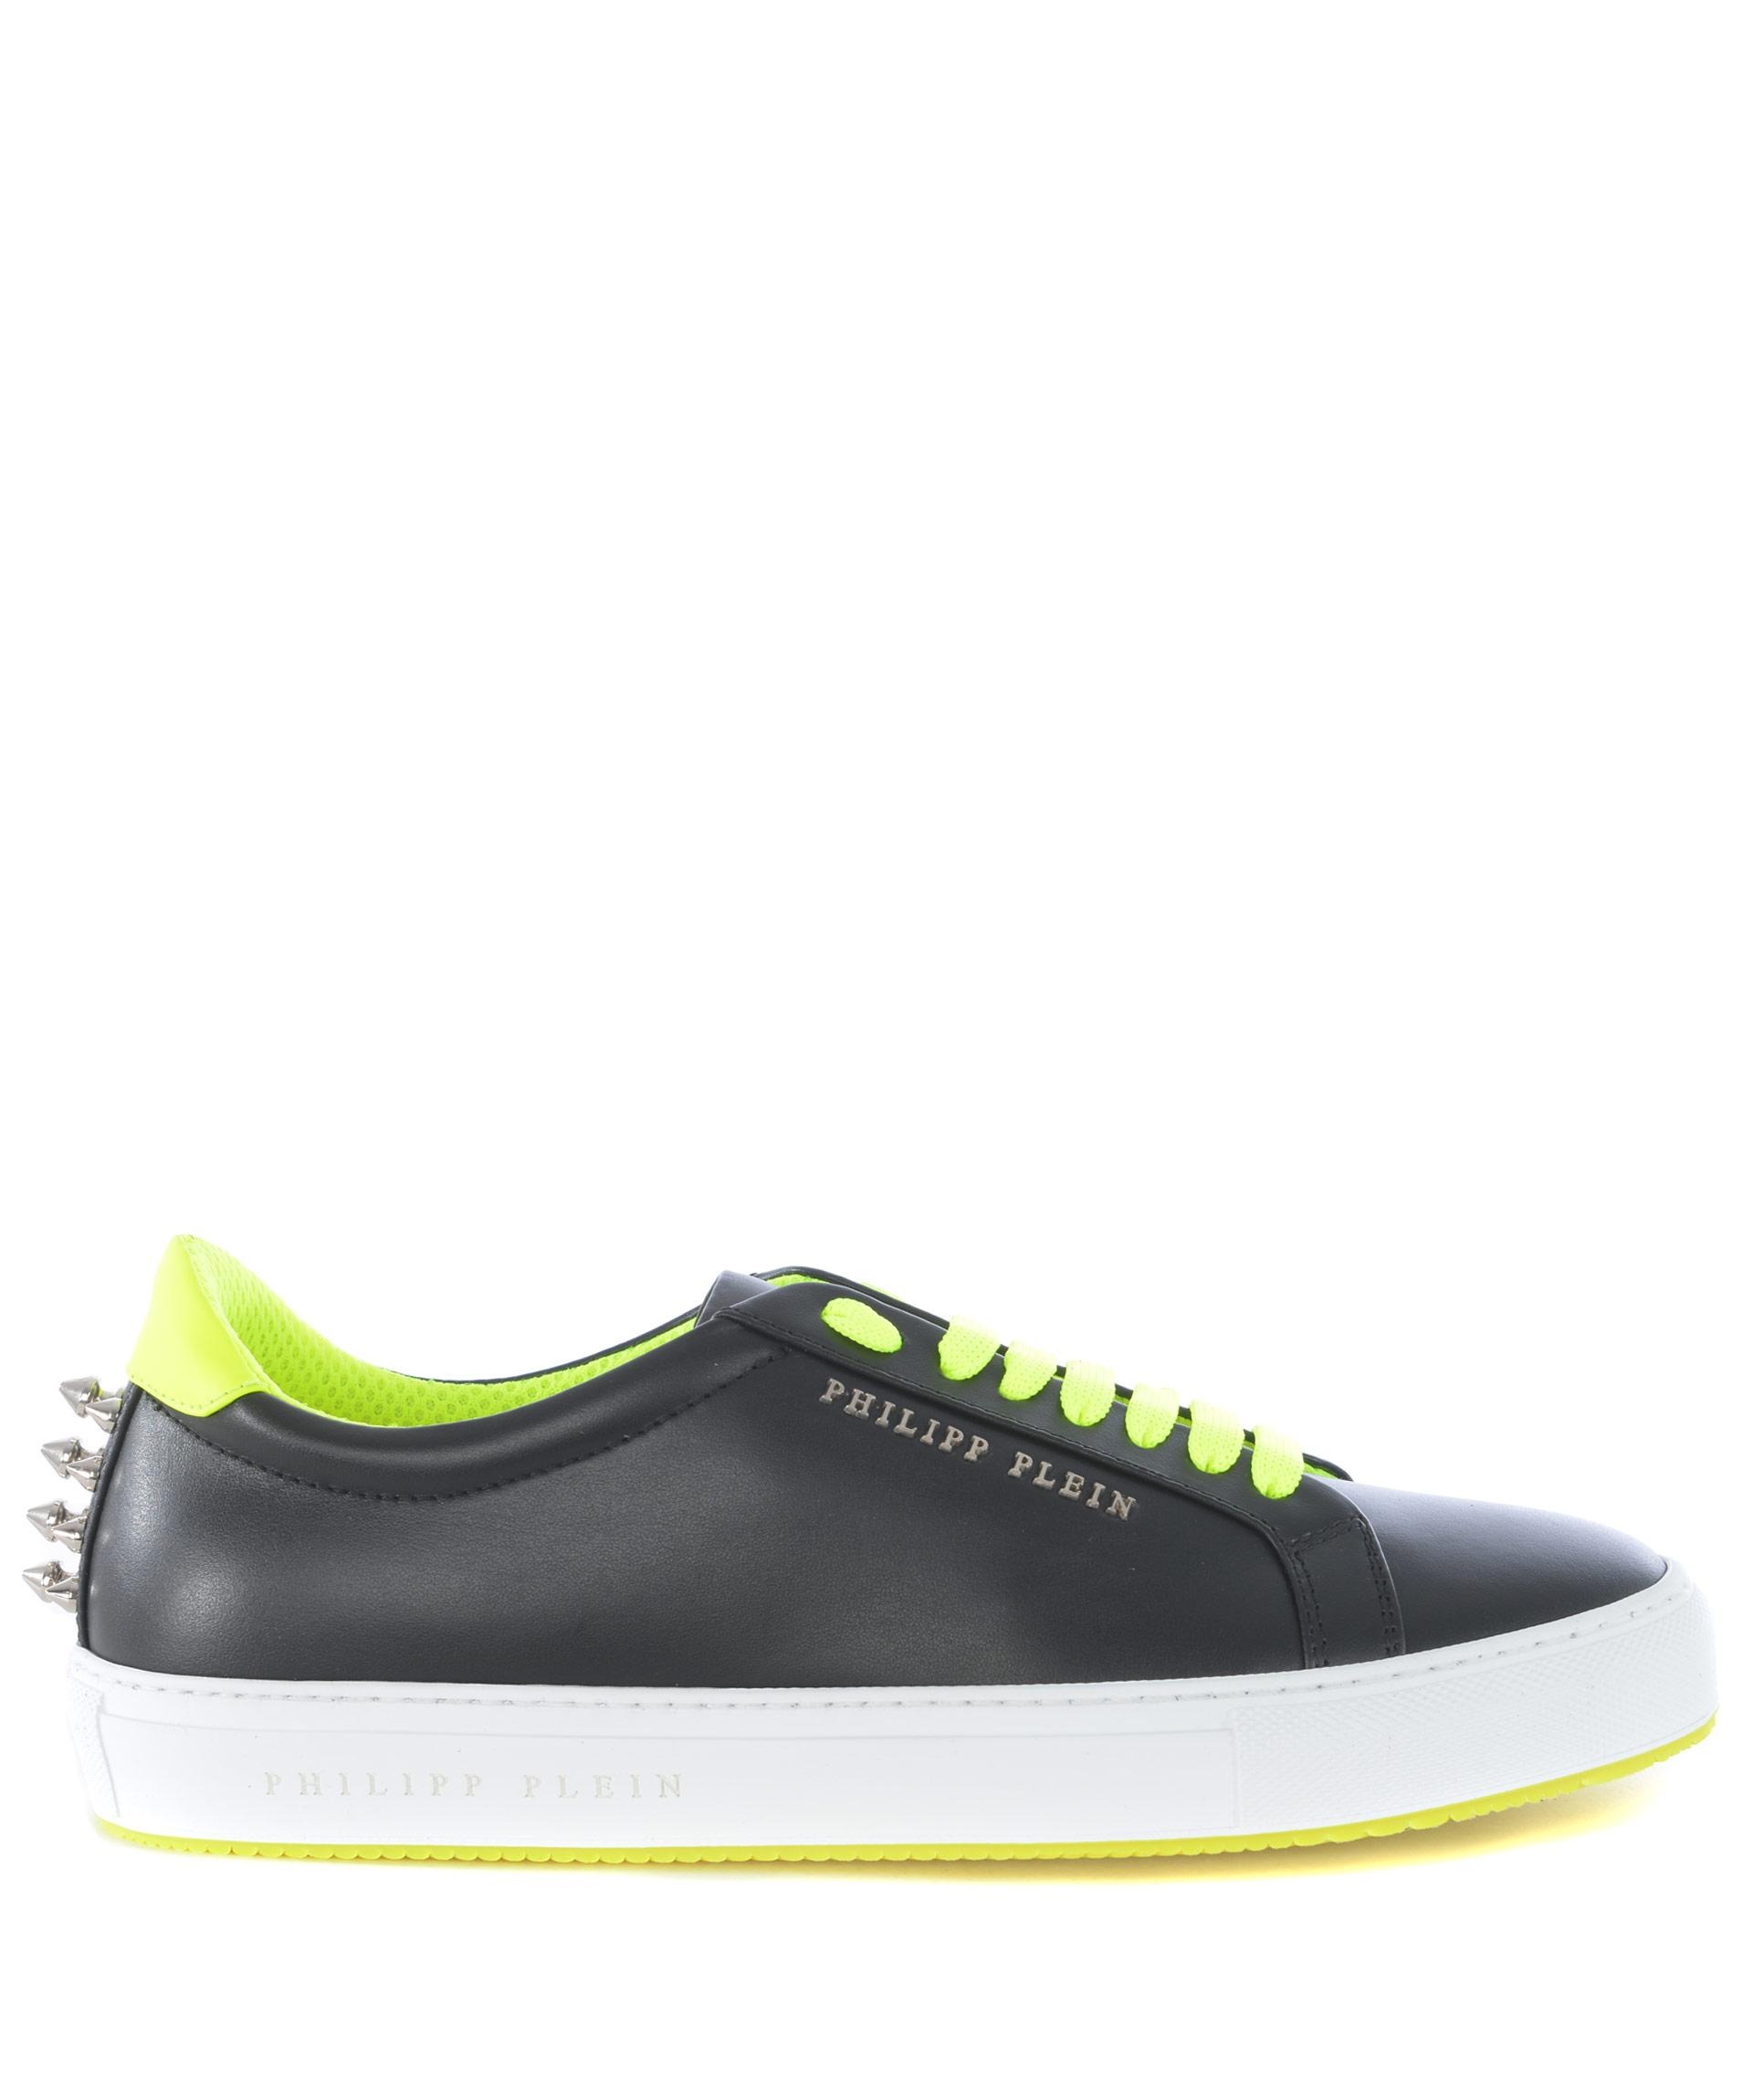 Sneakers uomo Philipp Plein